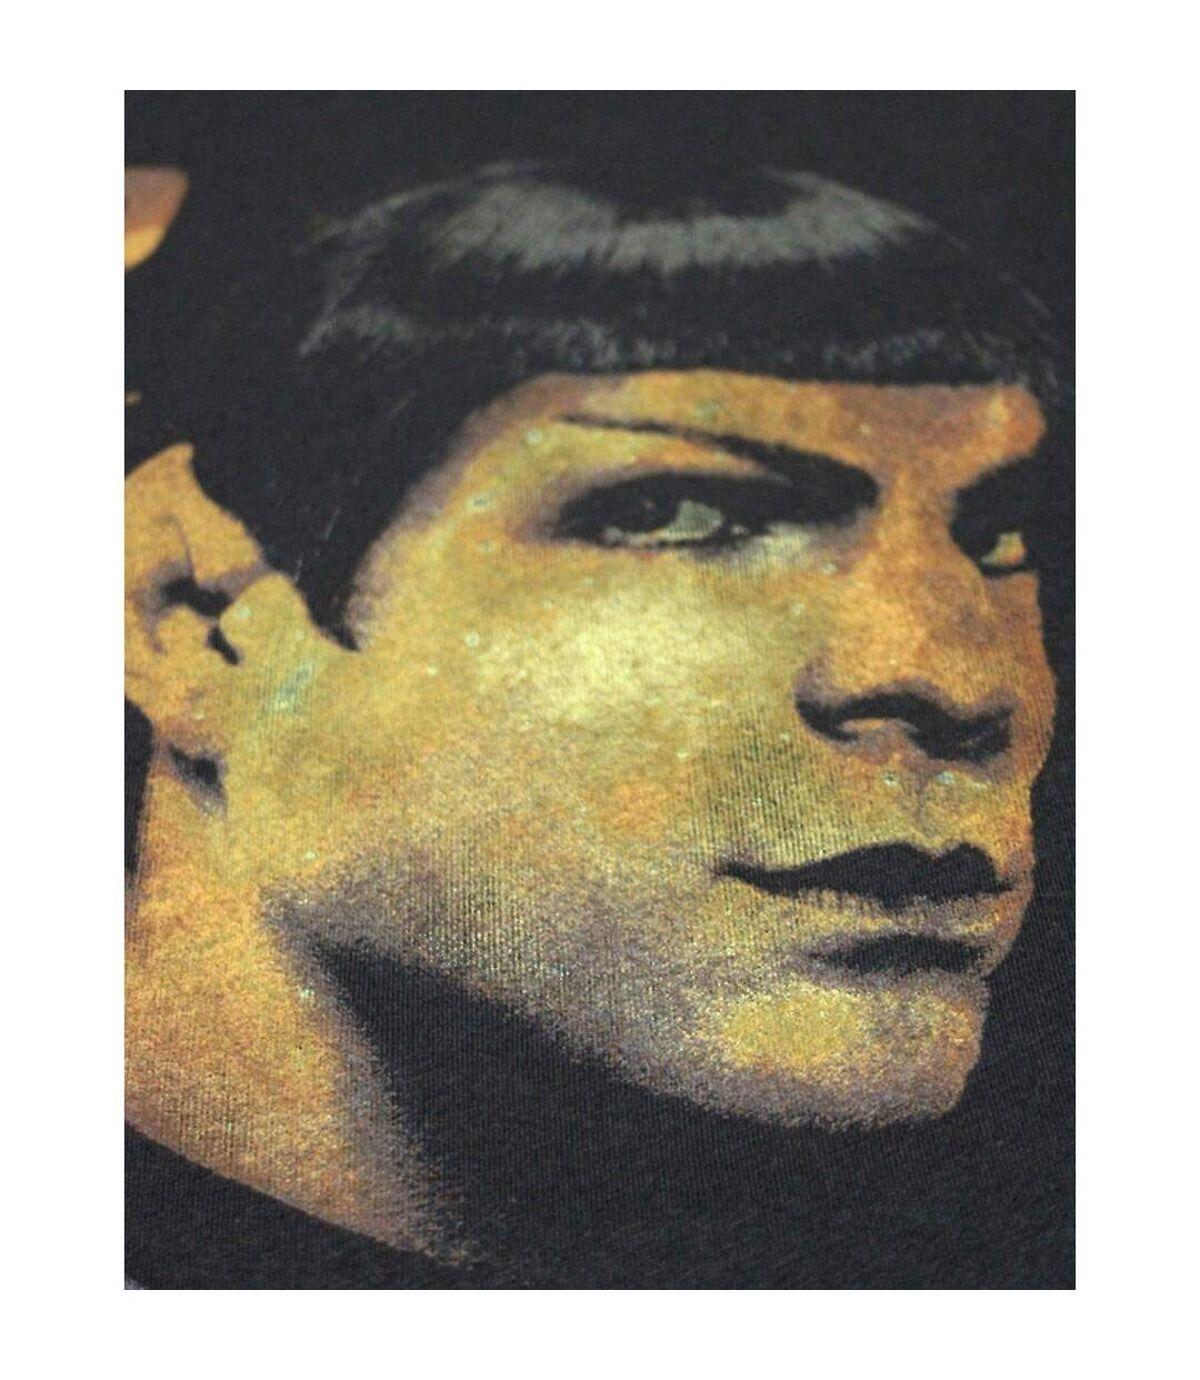 Junk Food Mens Portrait Spock Star Trek T-Shirt (Black) - UTNS5575